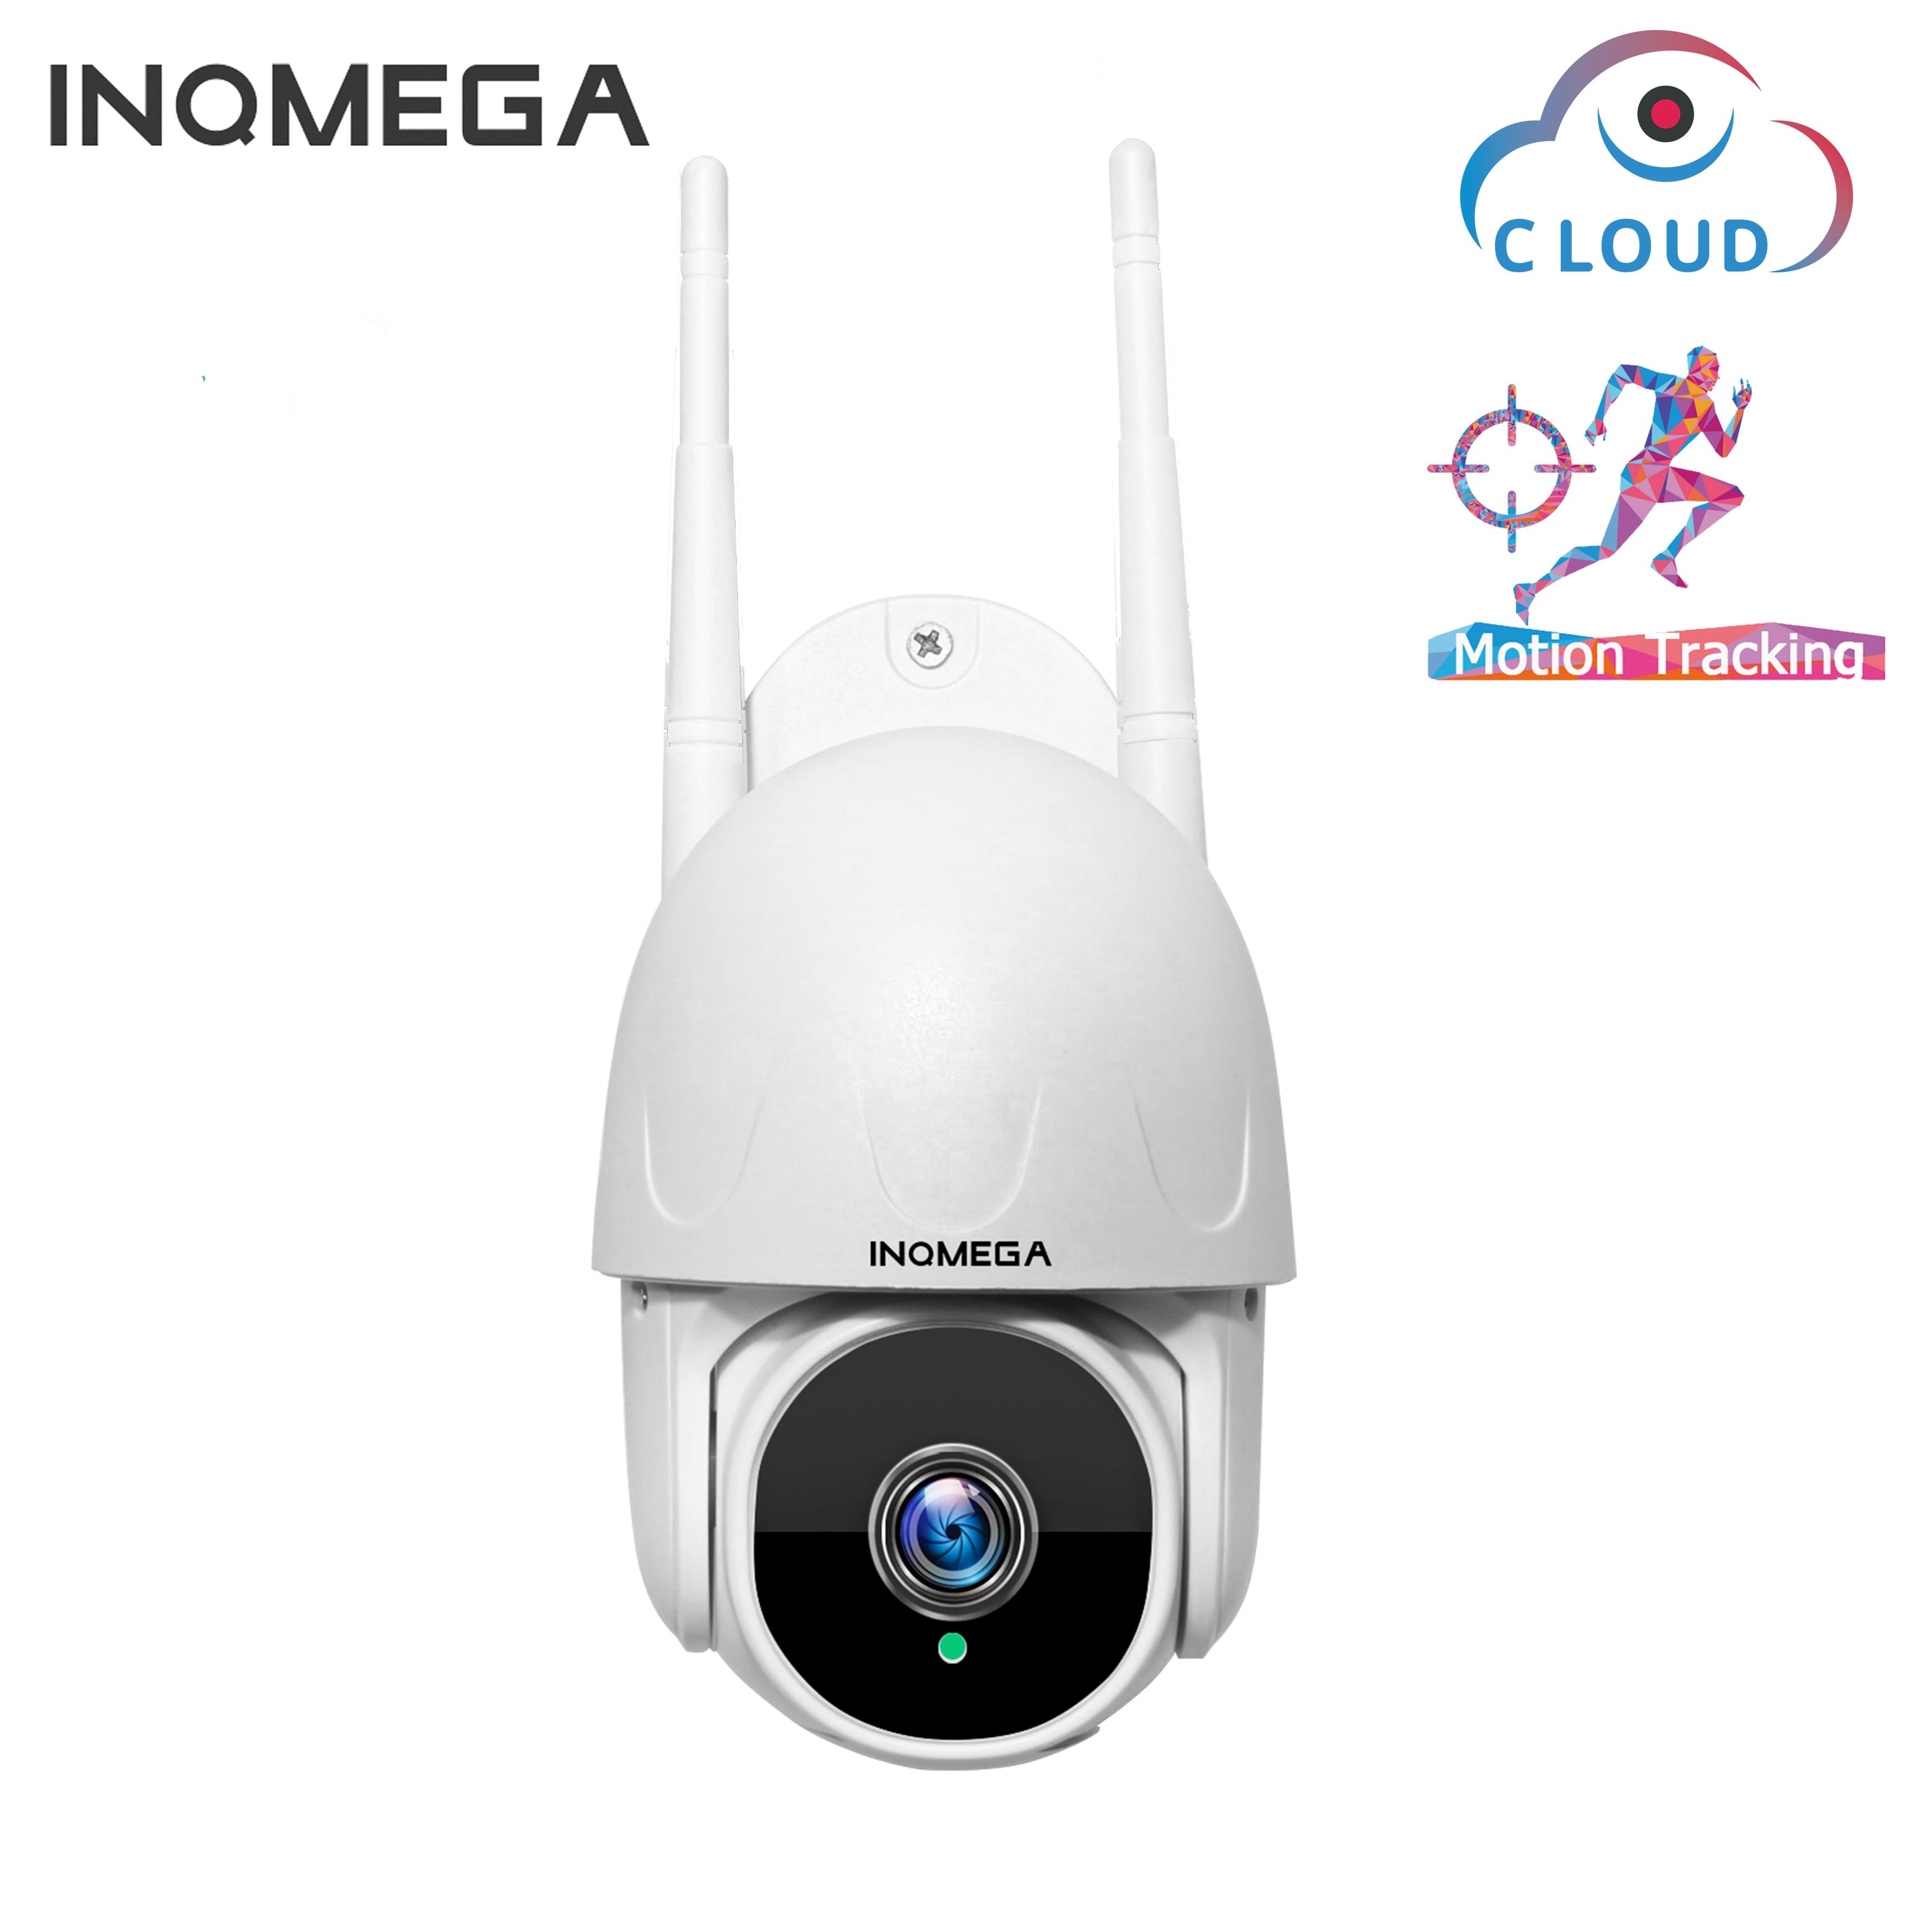 INQMEGA Wolke 1080P PTZ Speed Dome Wifi Kamera Outdoor 2MP Auto-Tracking Kamera ONVIF Drahtlose Kamera Home Überwachung IP Cam